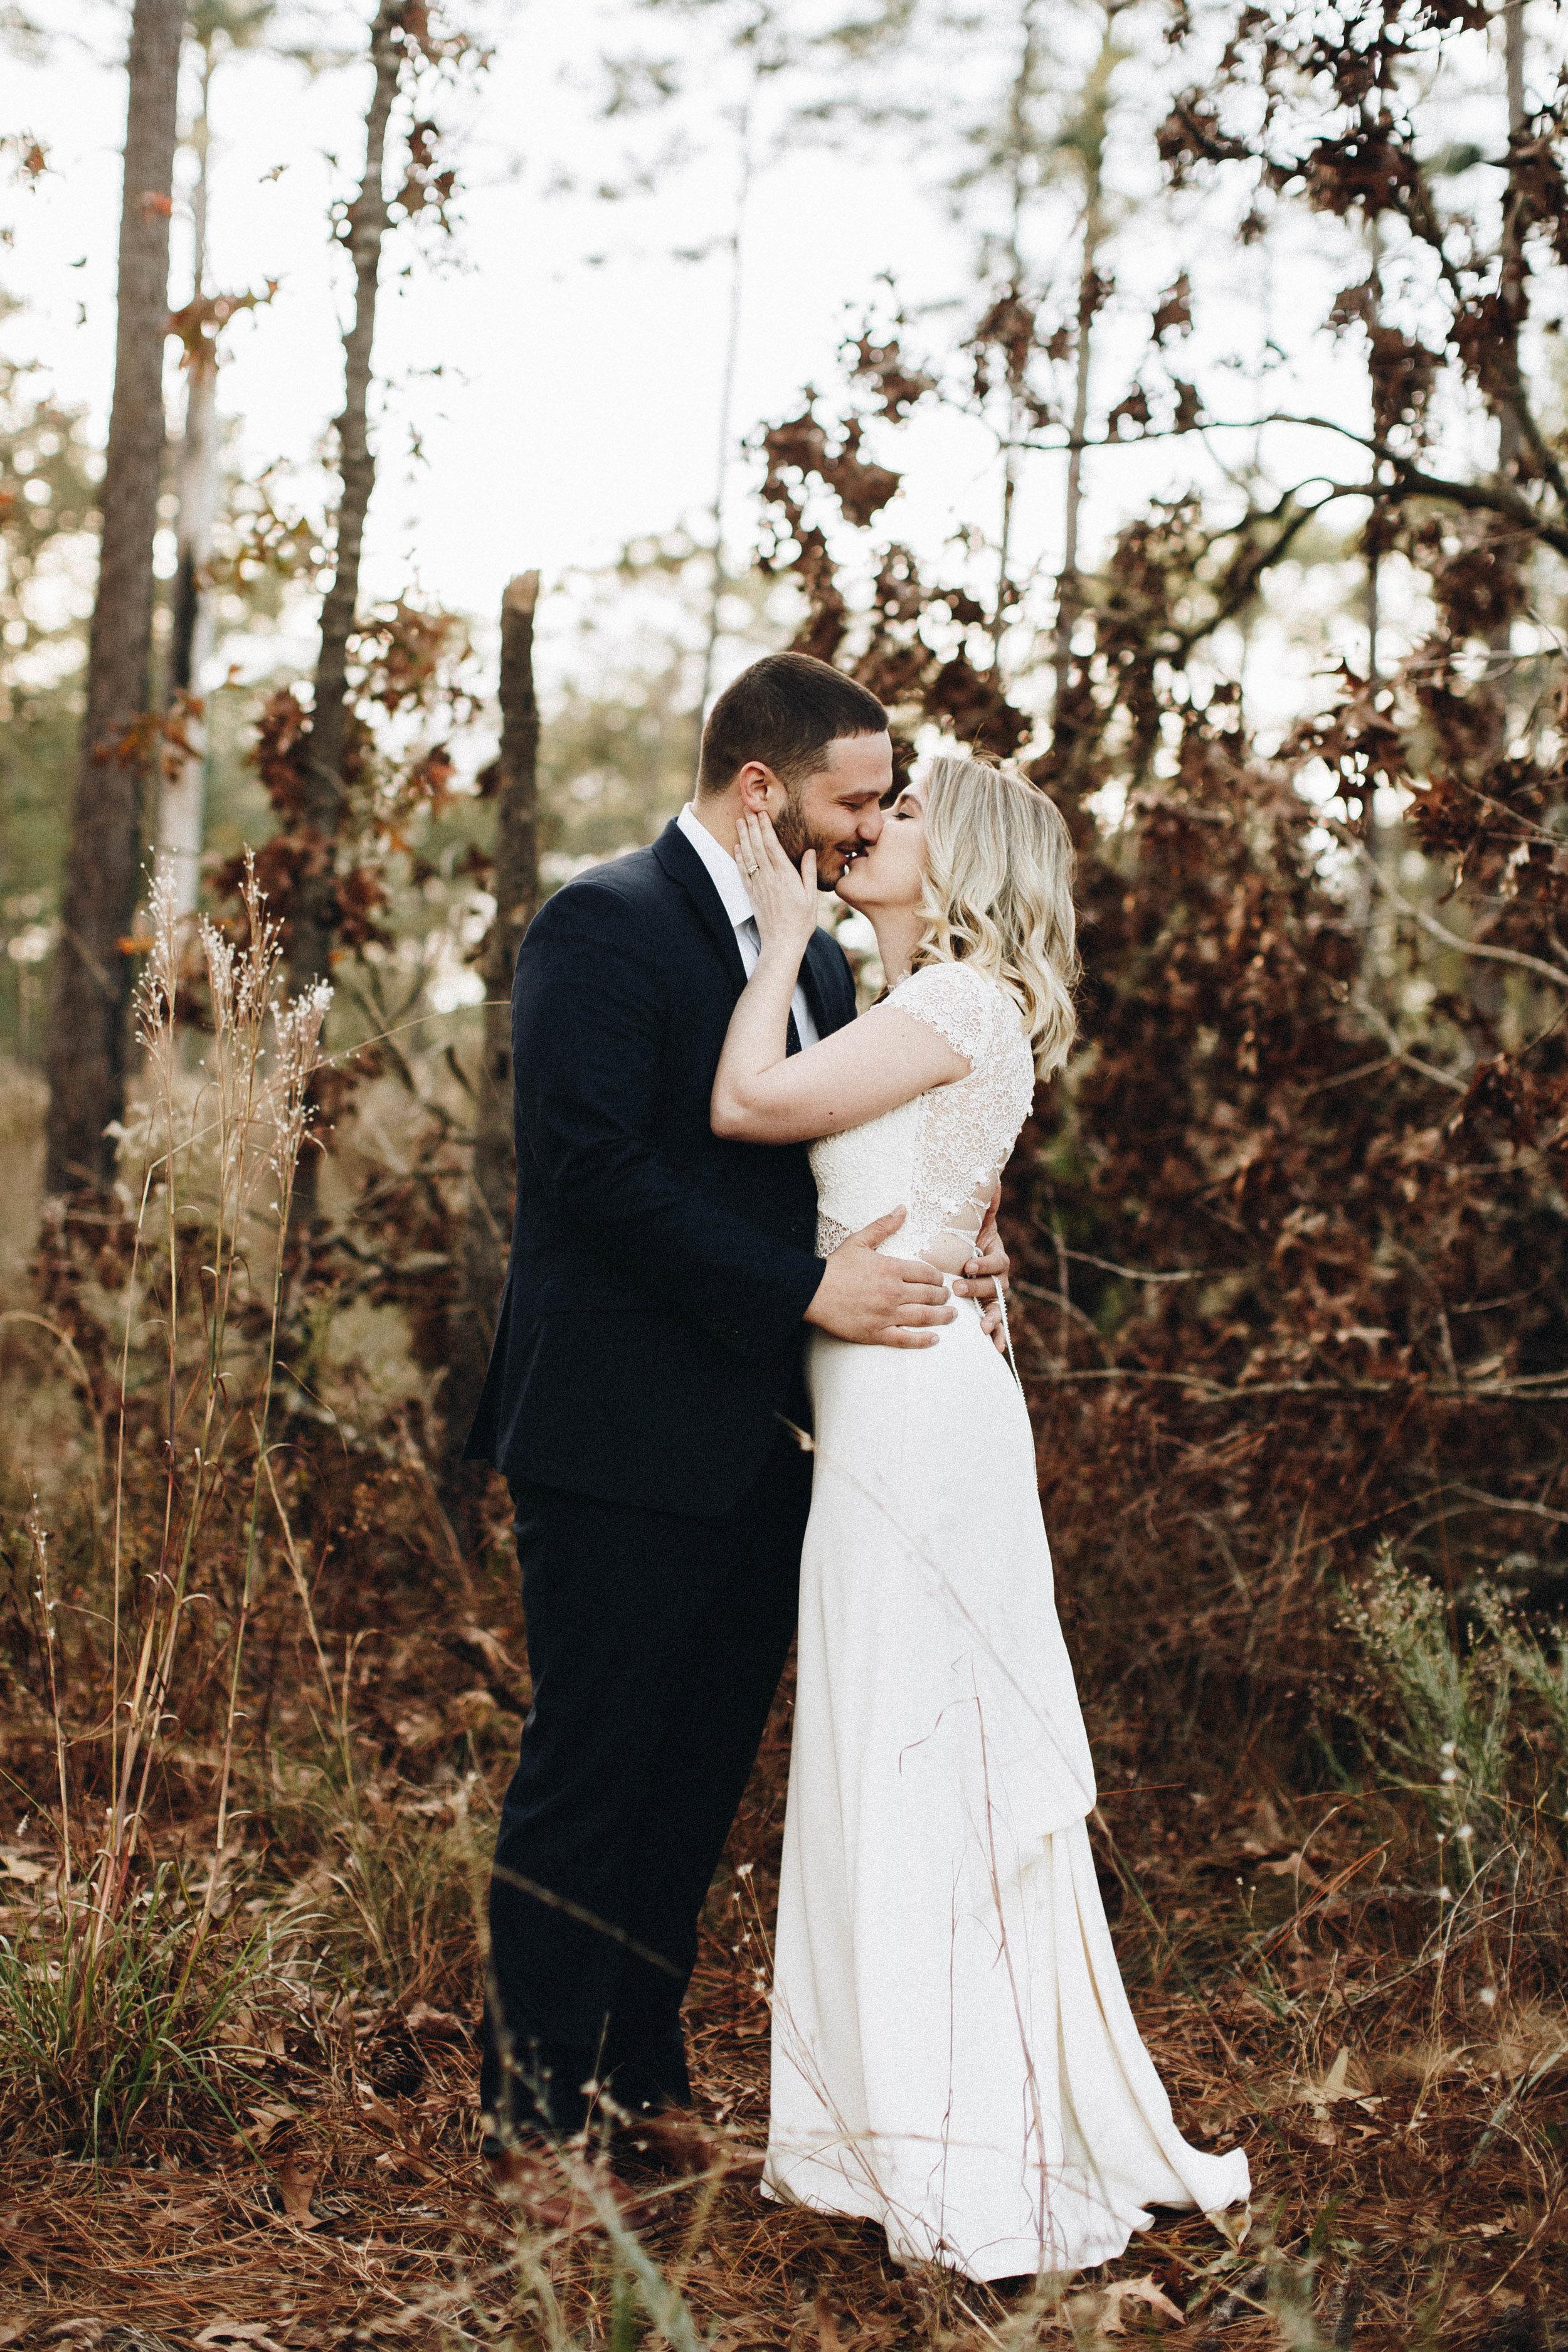 Orlando+wedding+photographer-12.jpeg